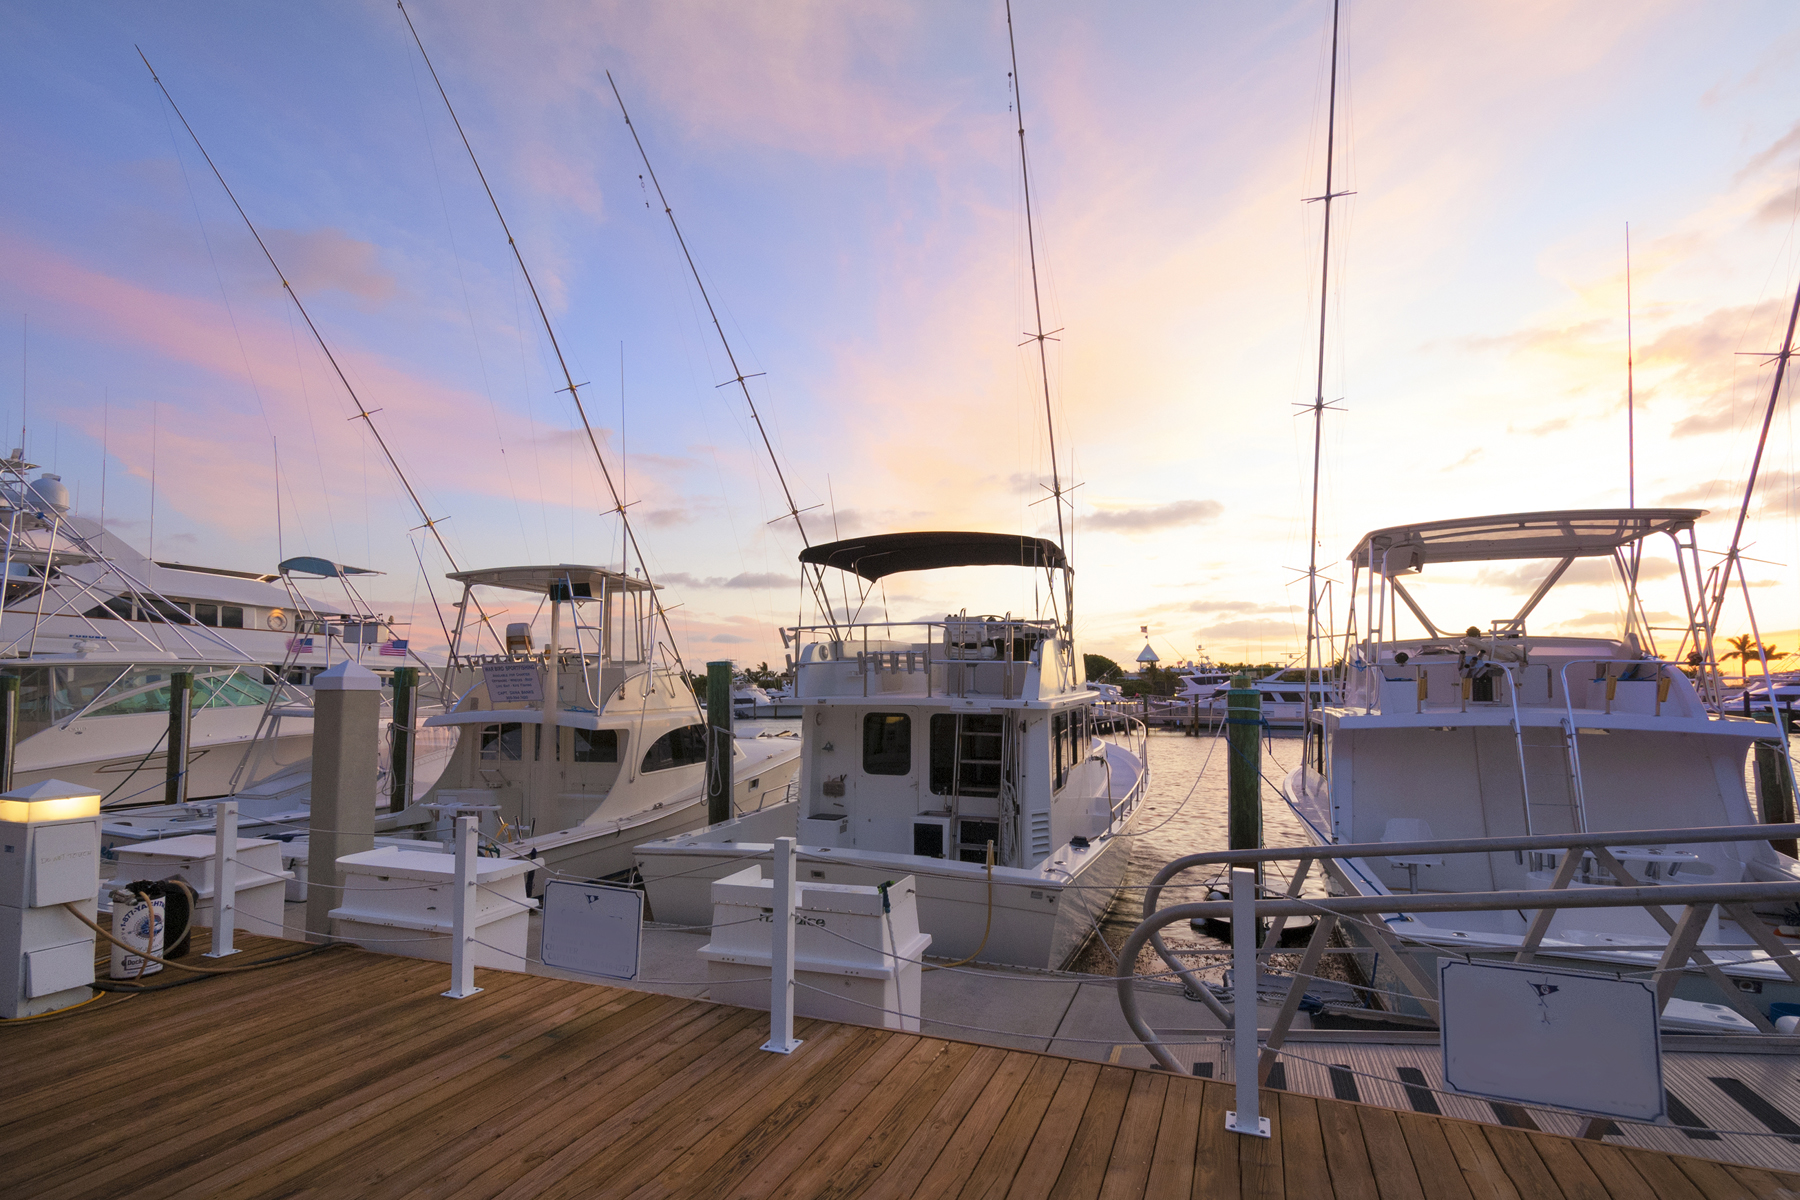 Additional photo for property listing at Spacious Canalfront Lot at Ocean Reef 25 Cardinal Lane Key Largo, Florida 33037 États-Unis